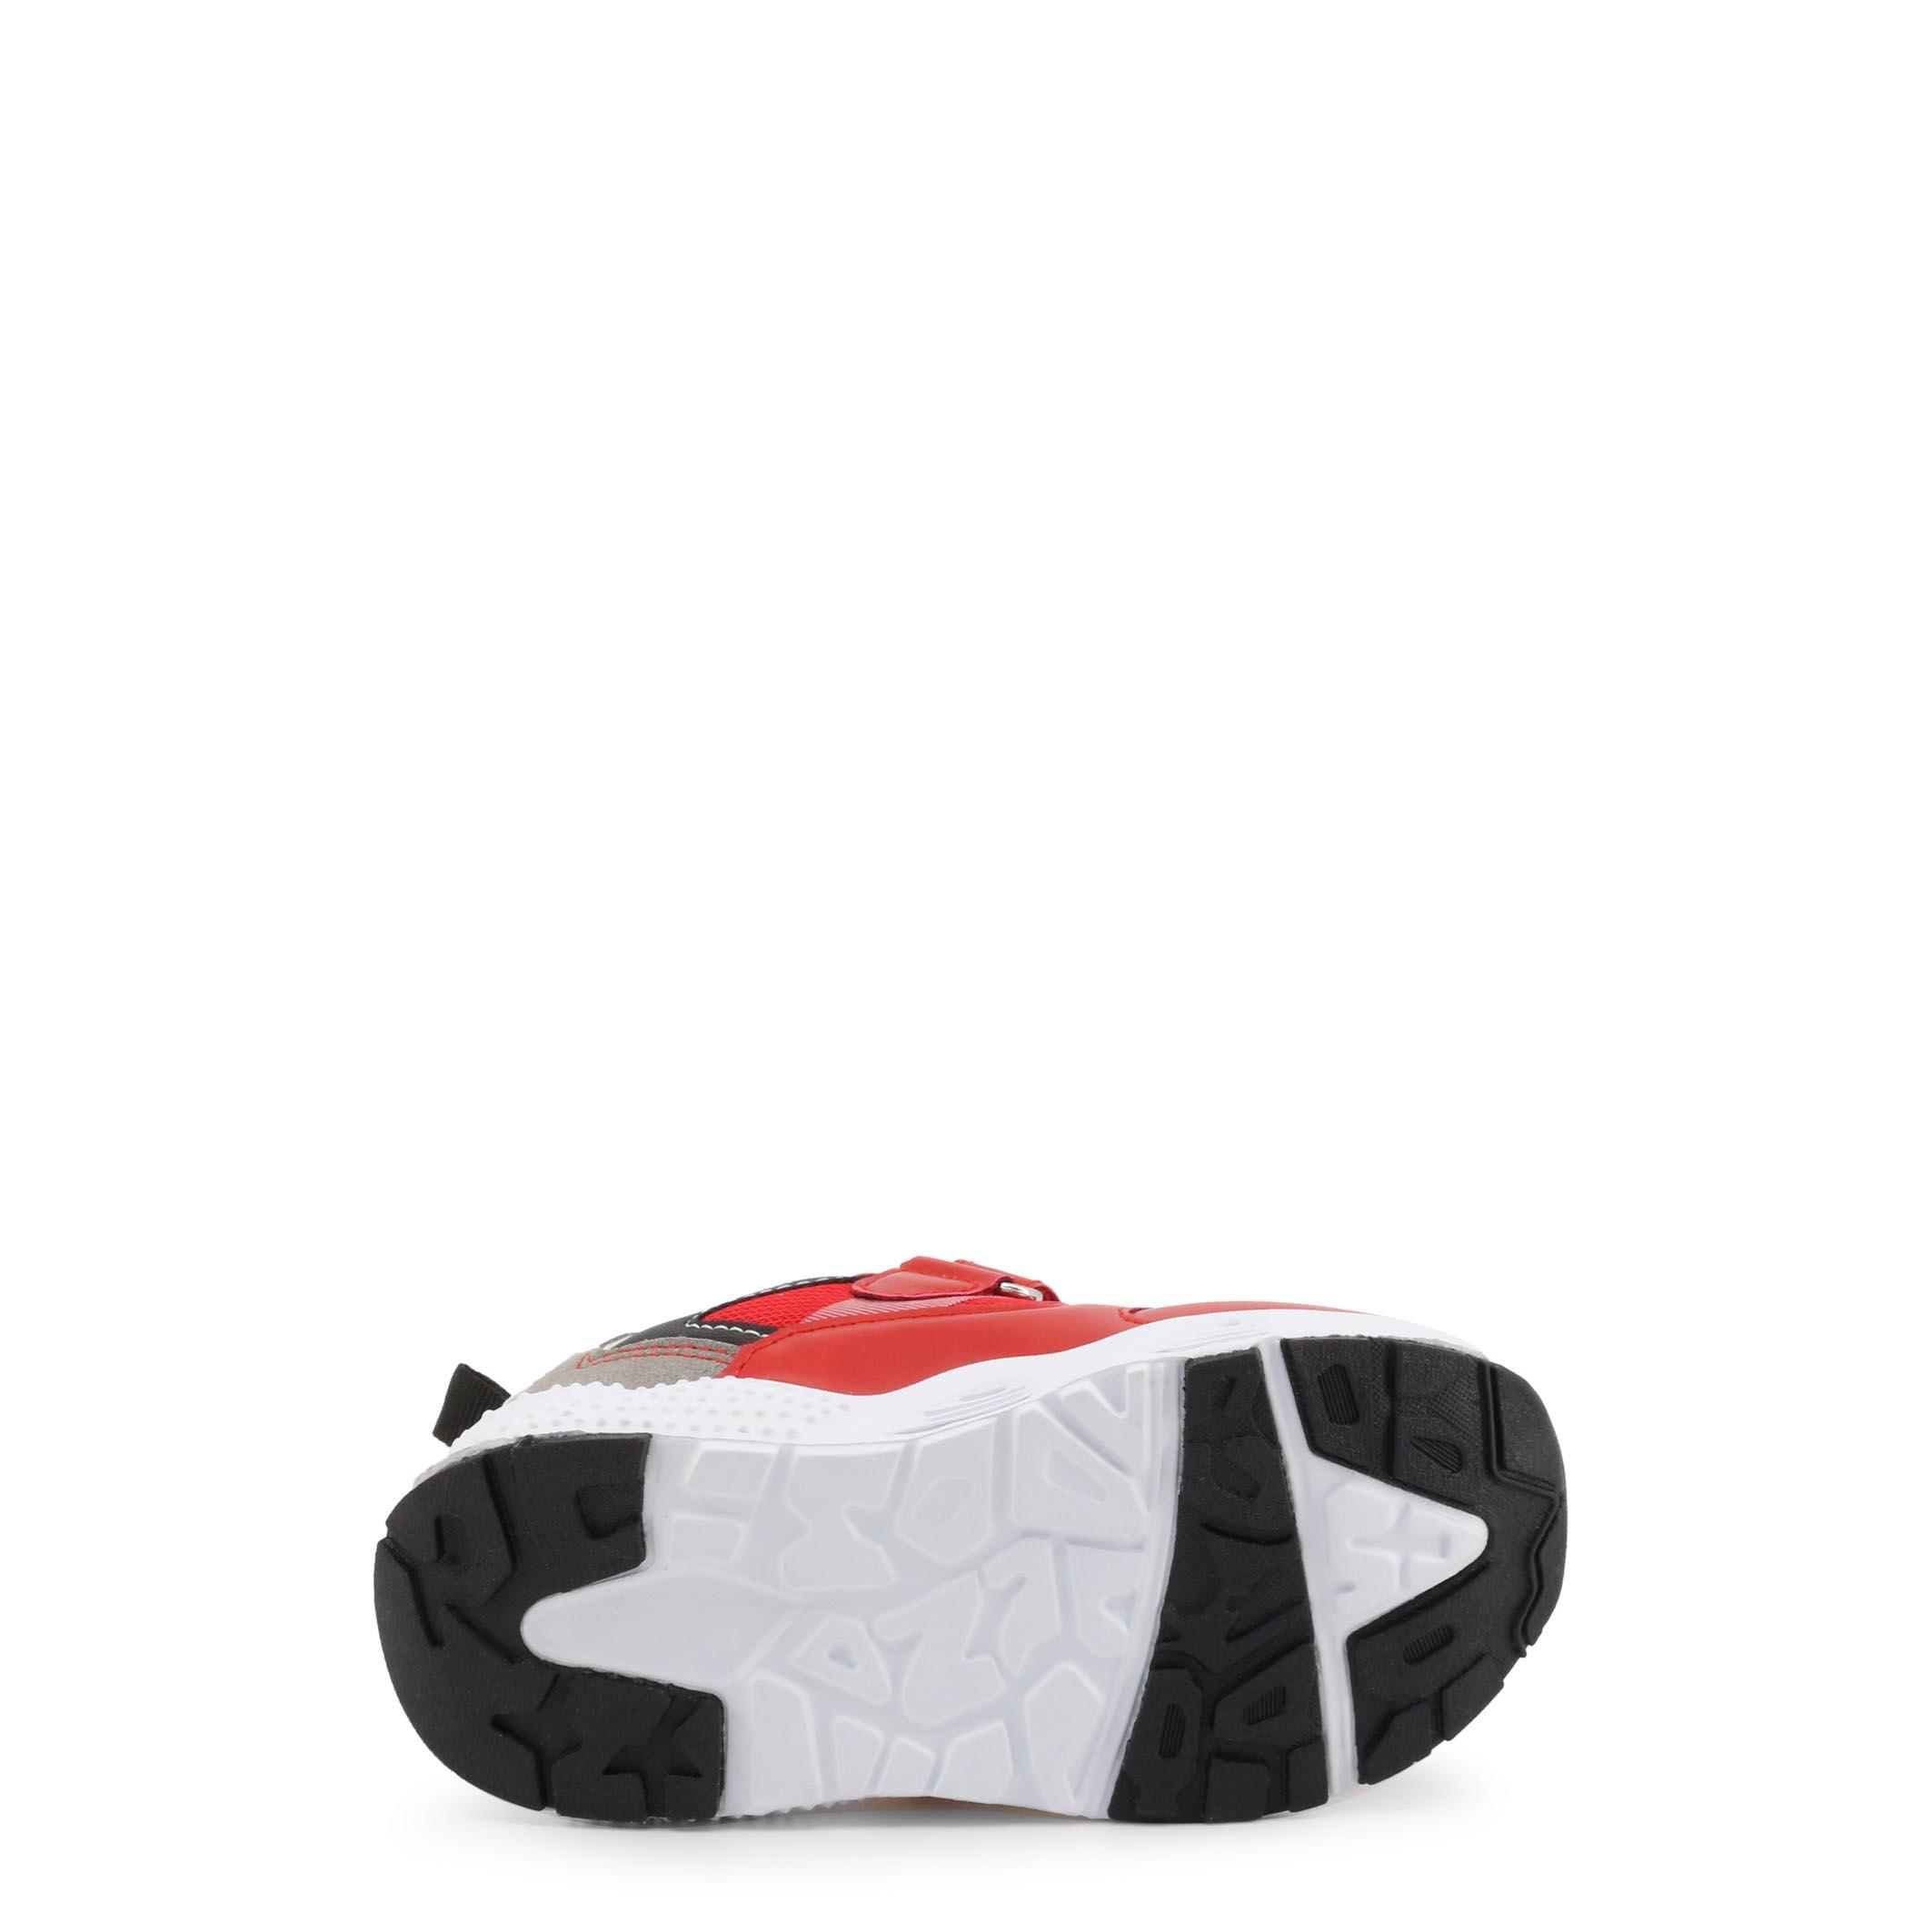 Shone – 10260-021 – Rood Designeritems.nl